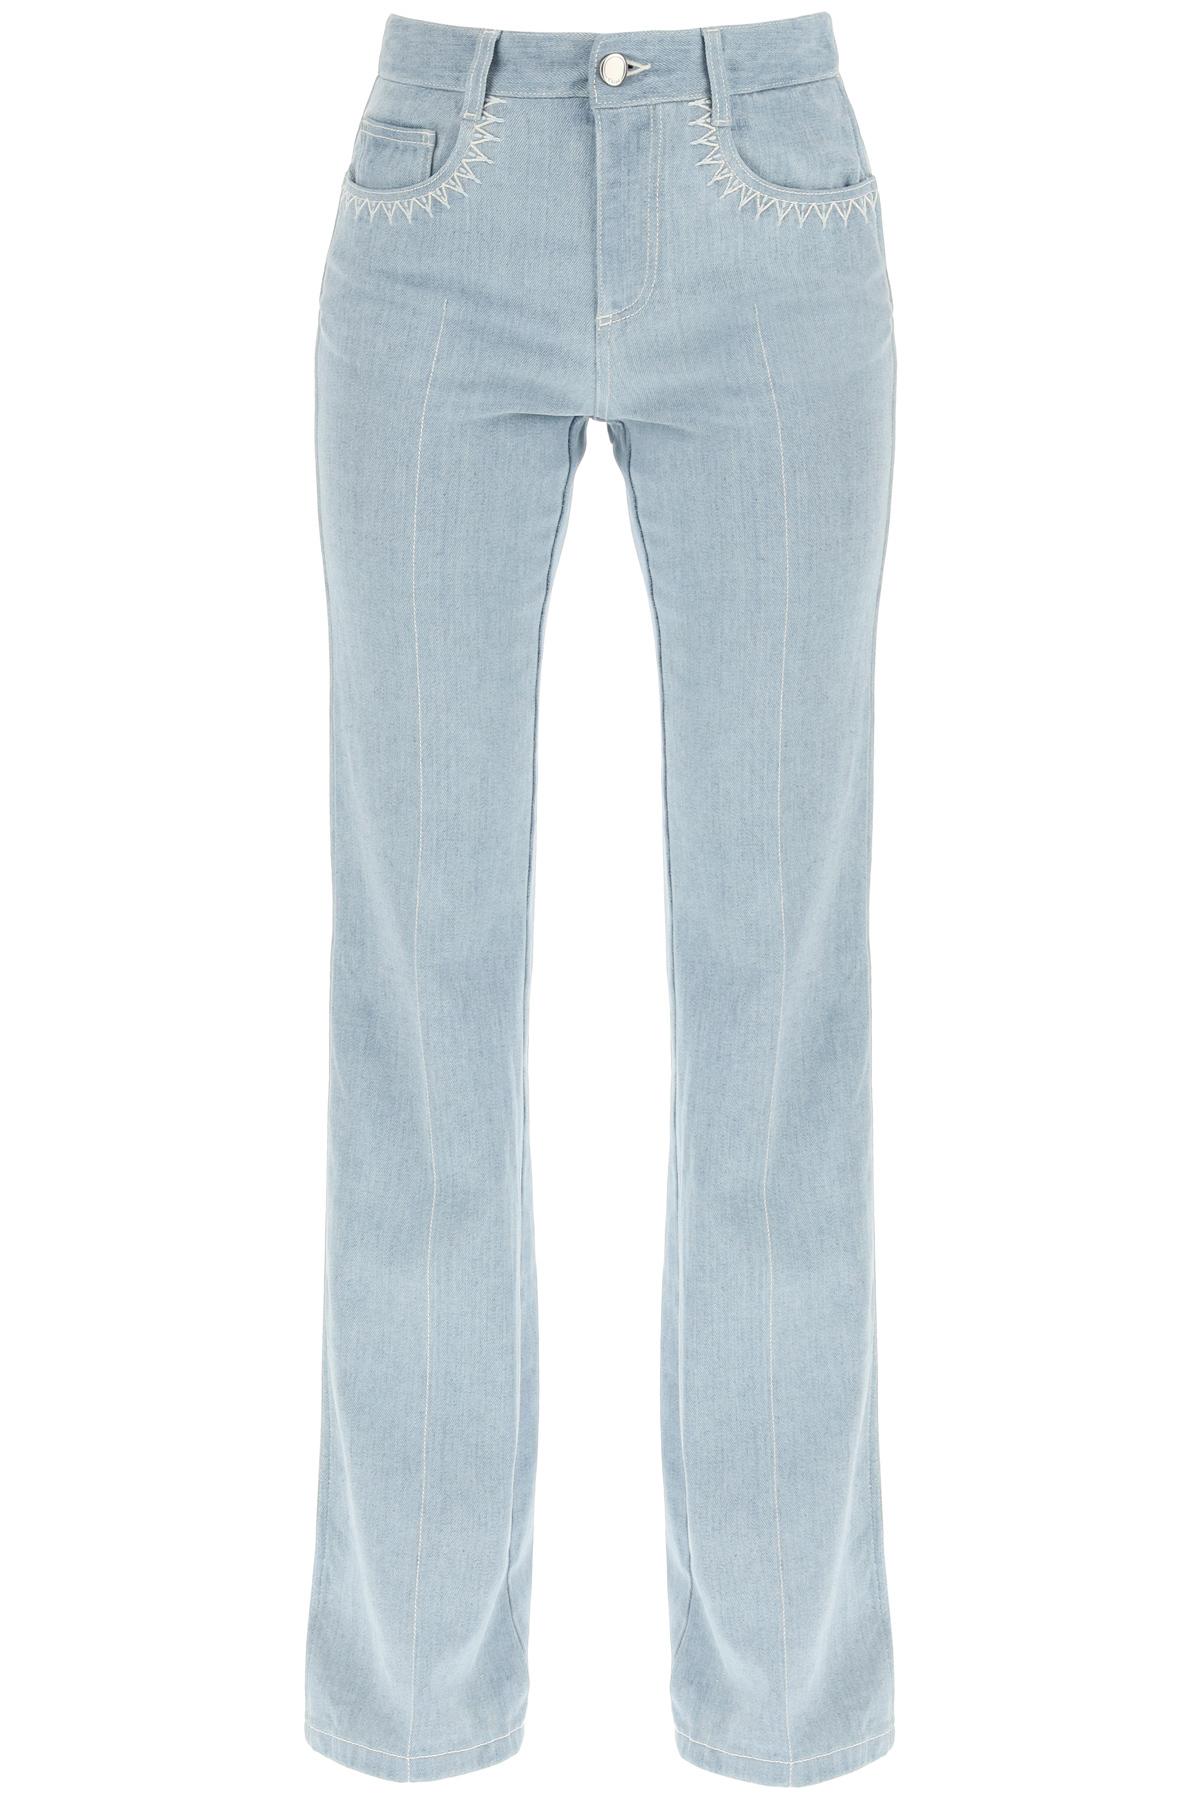 Chloe' jeans flare con logo laser